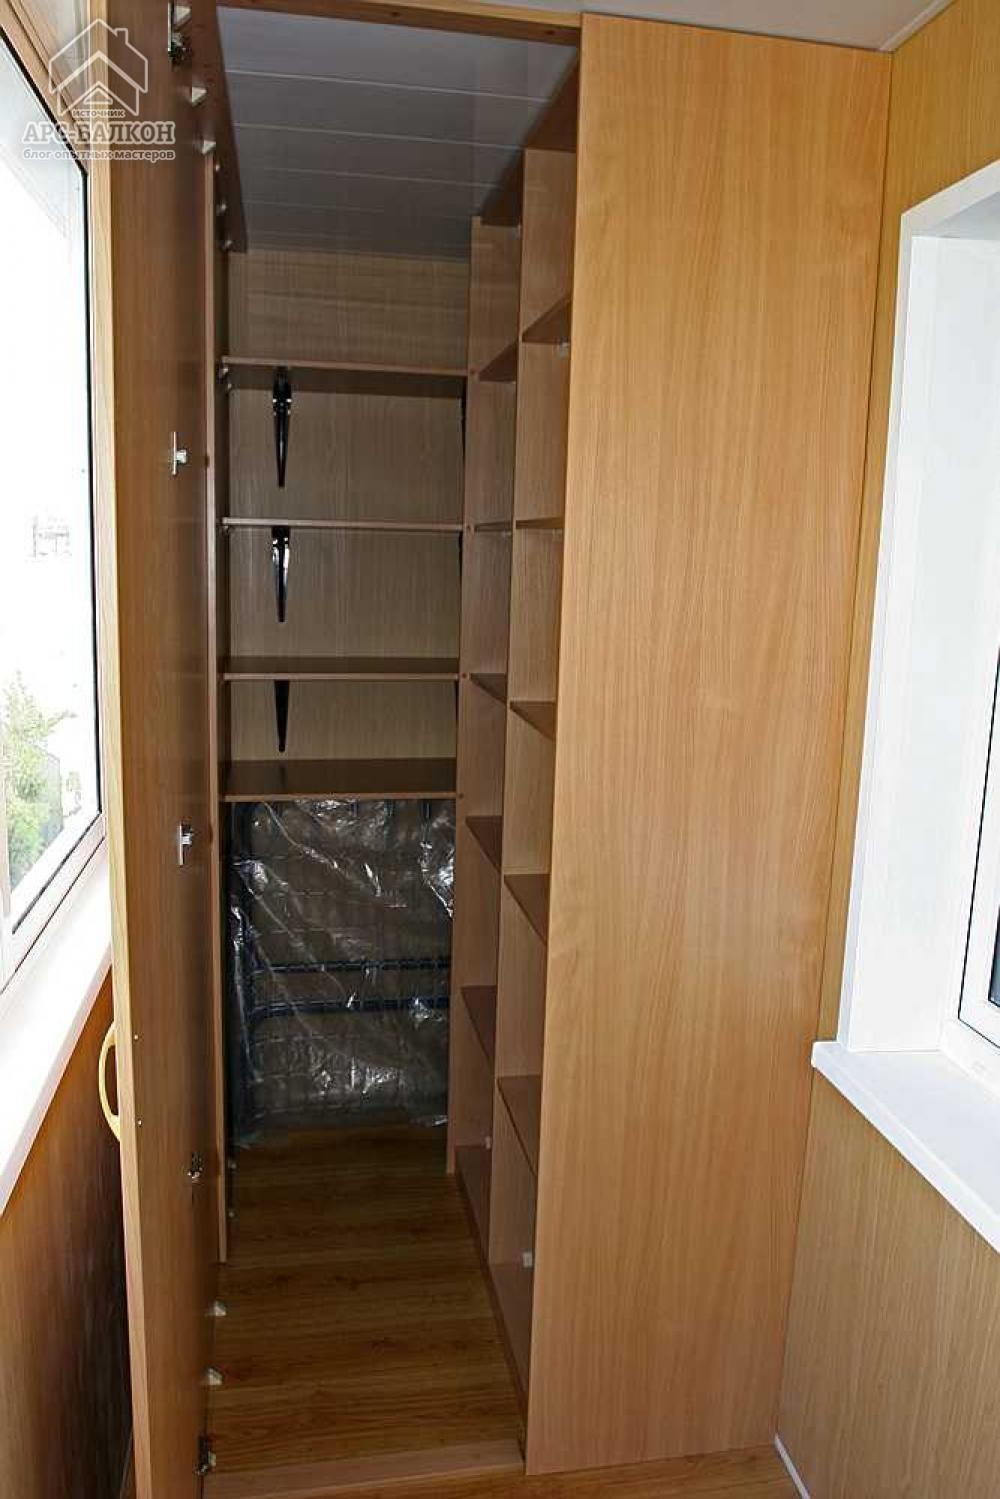 Шкафы на балкон и лоджию от частного мастера.